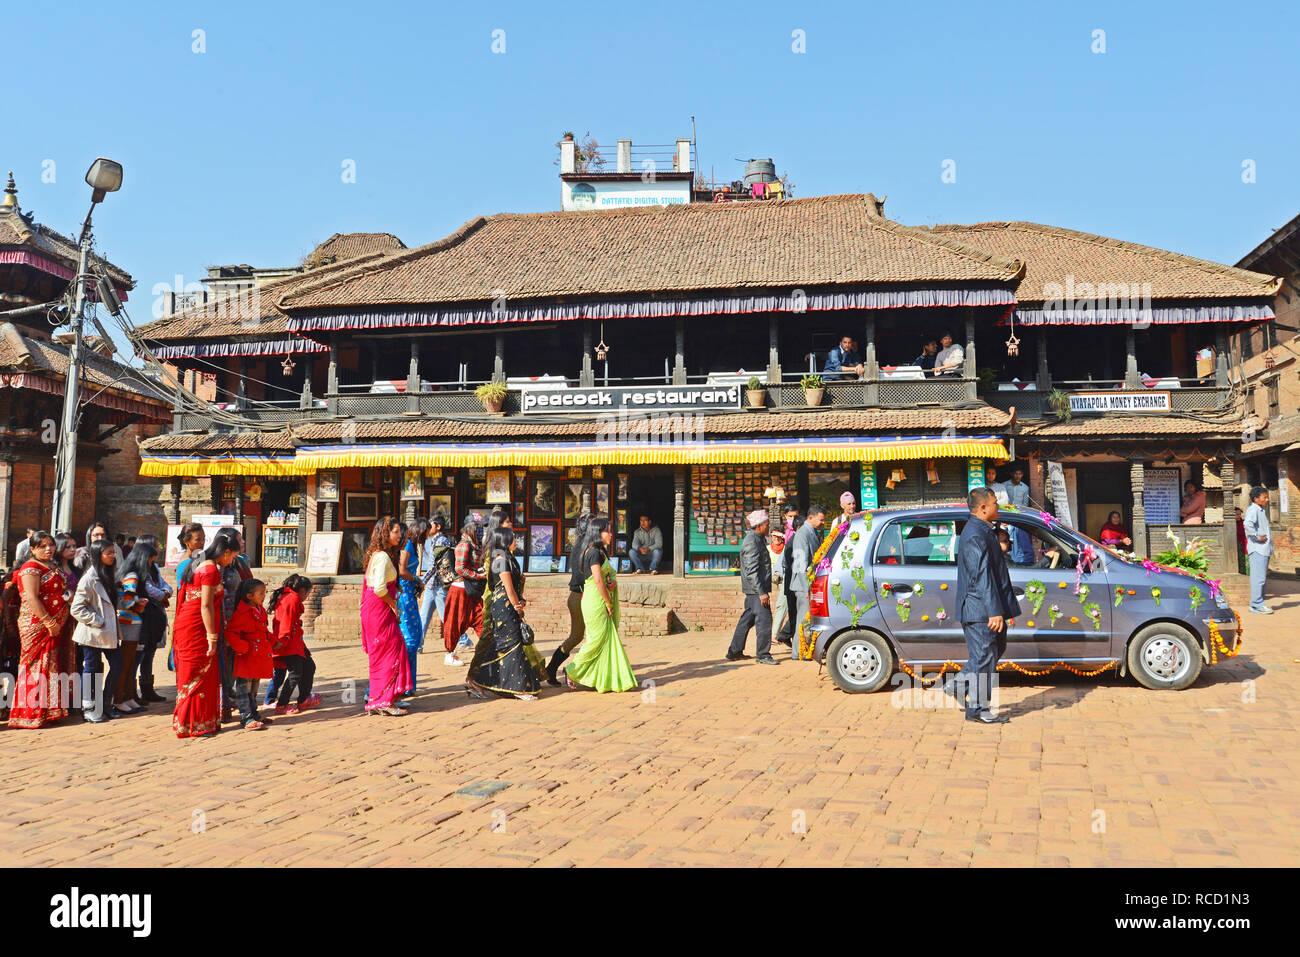 mariage parade in street of  Bhaktapur, Nepal - Stock Image